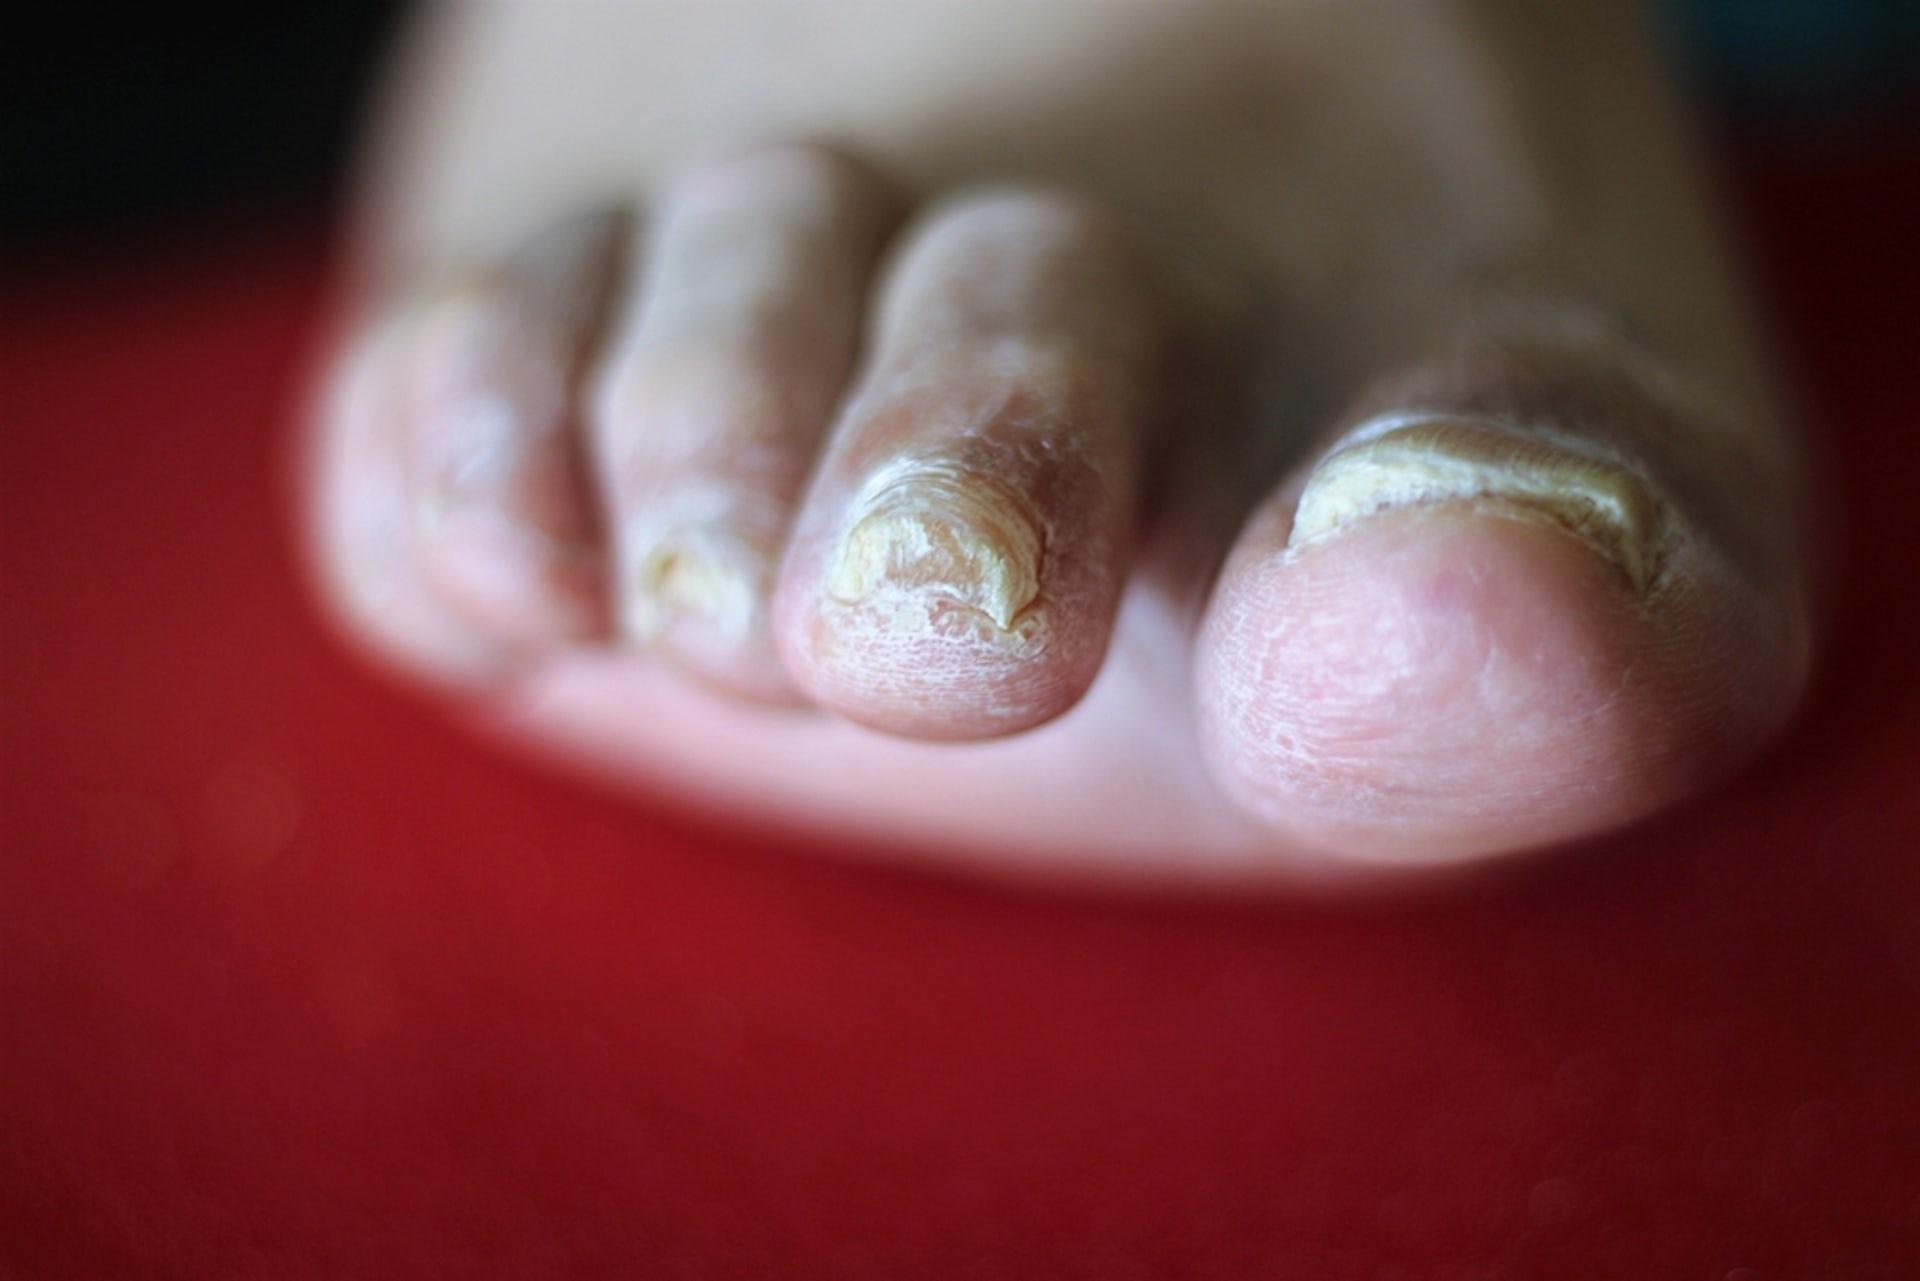 How to make a broken toenail heal faster